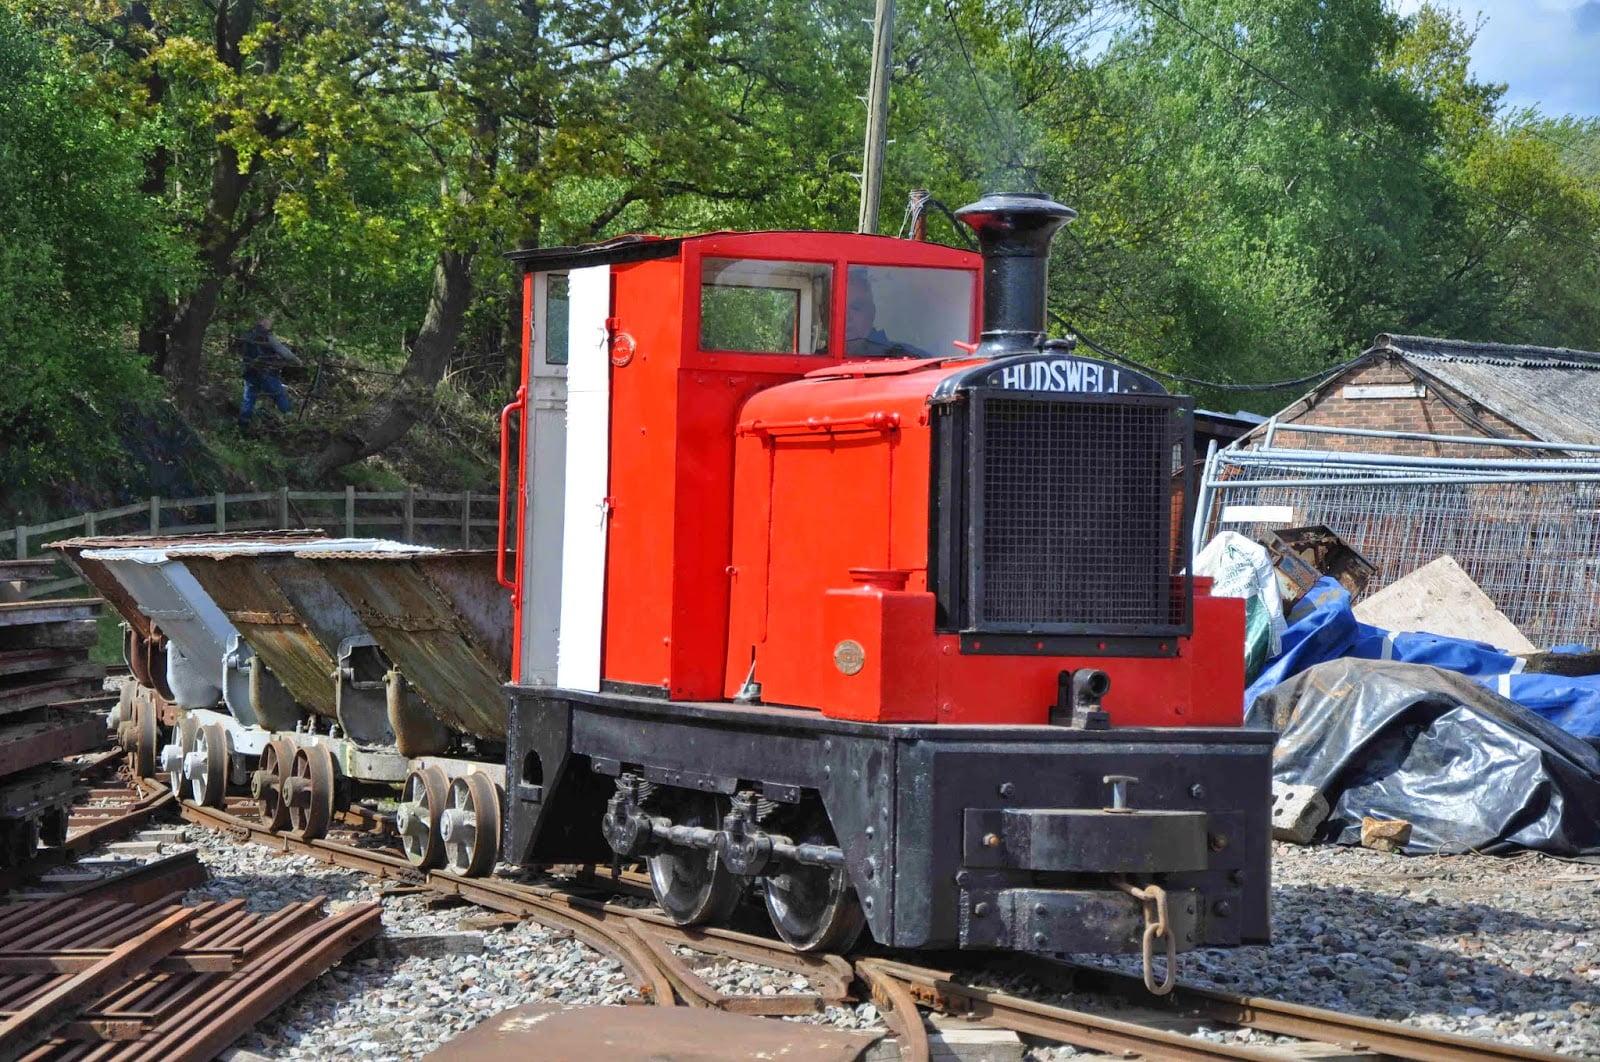 Hudswell D558 // Credit: Amerton Railway